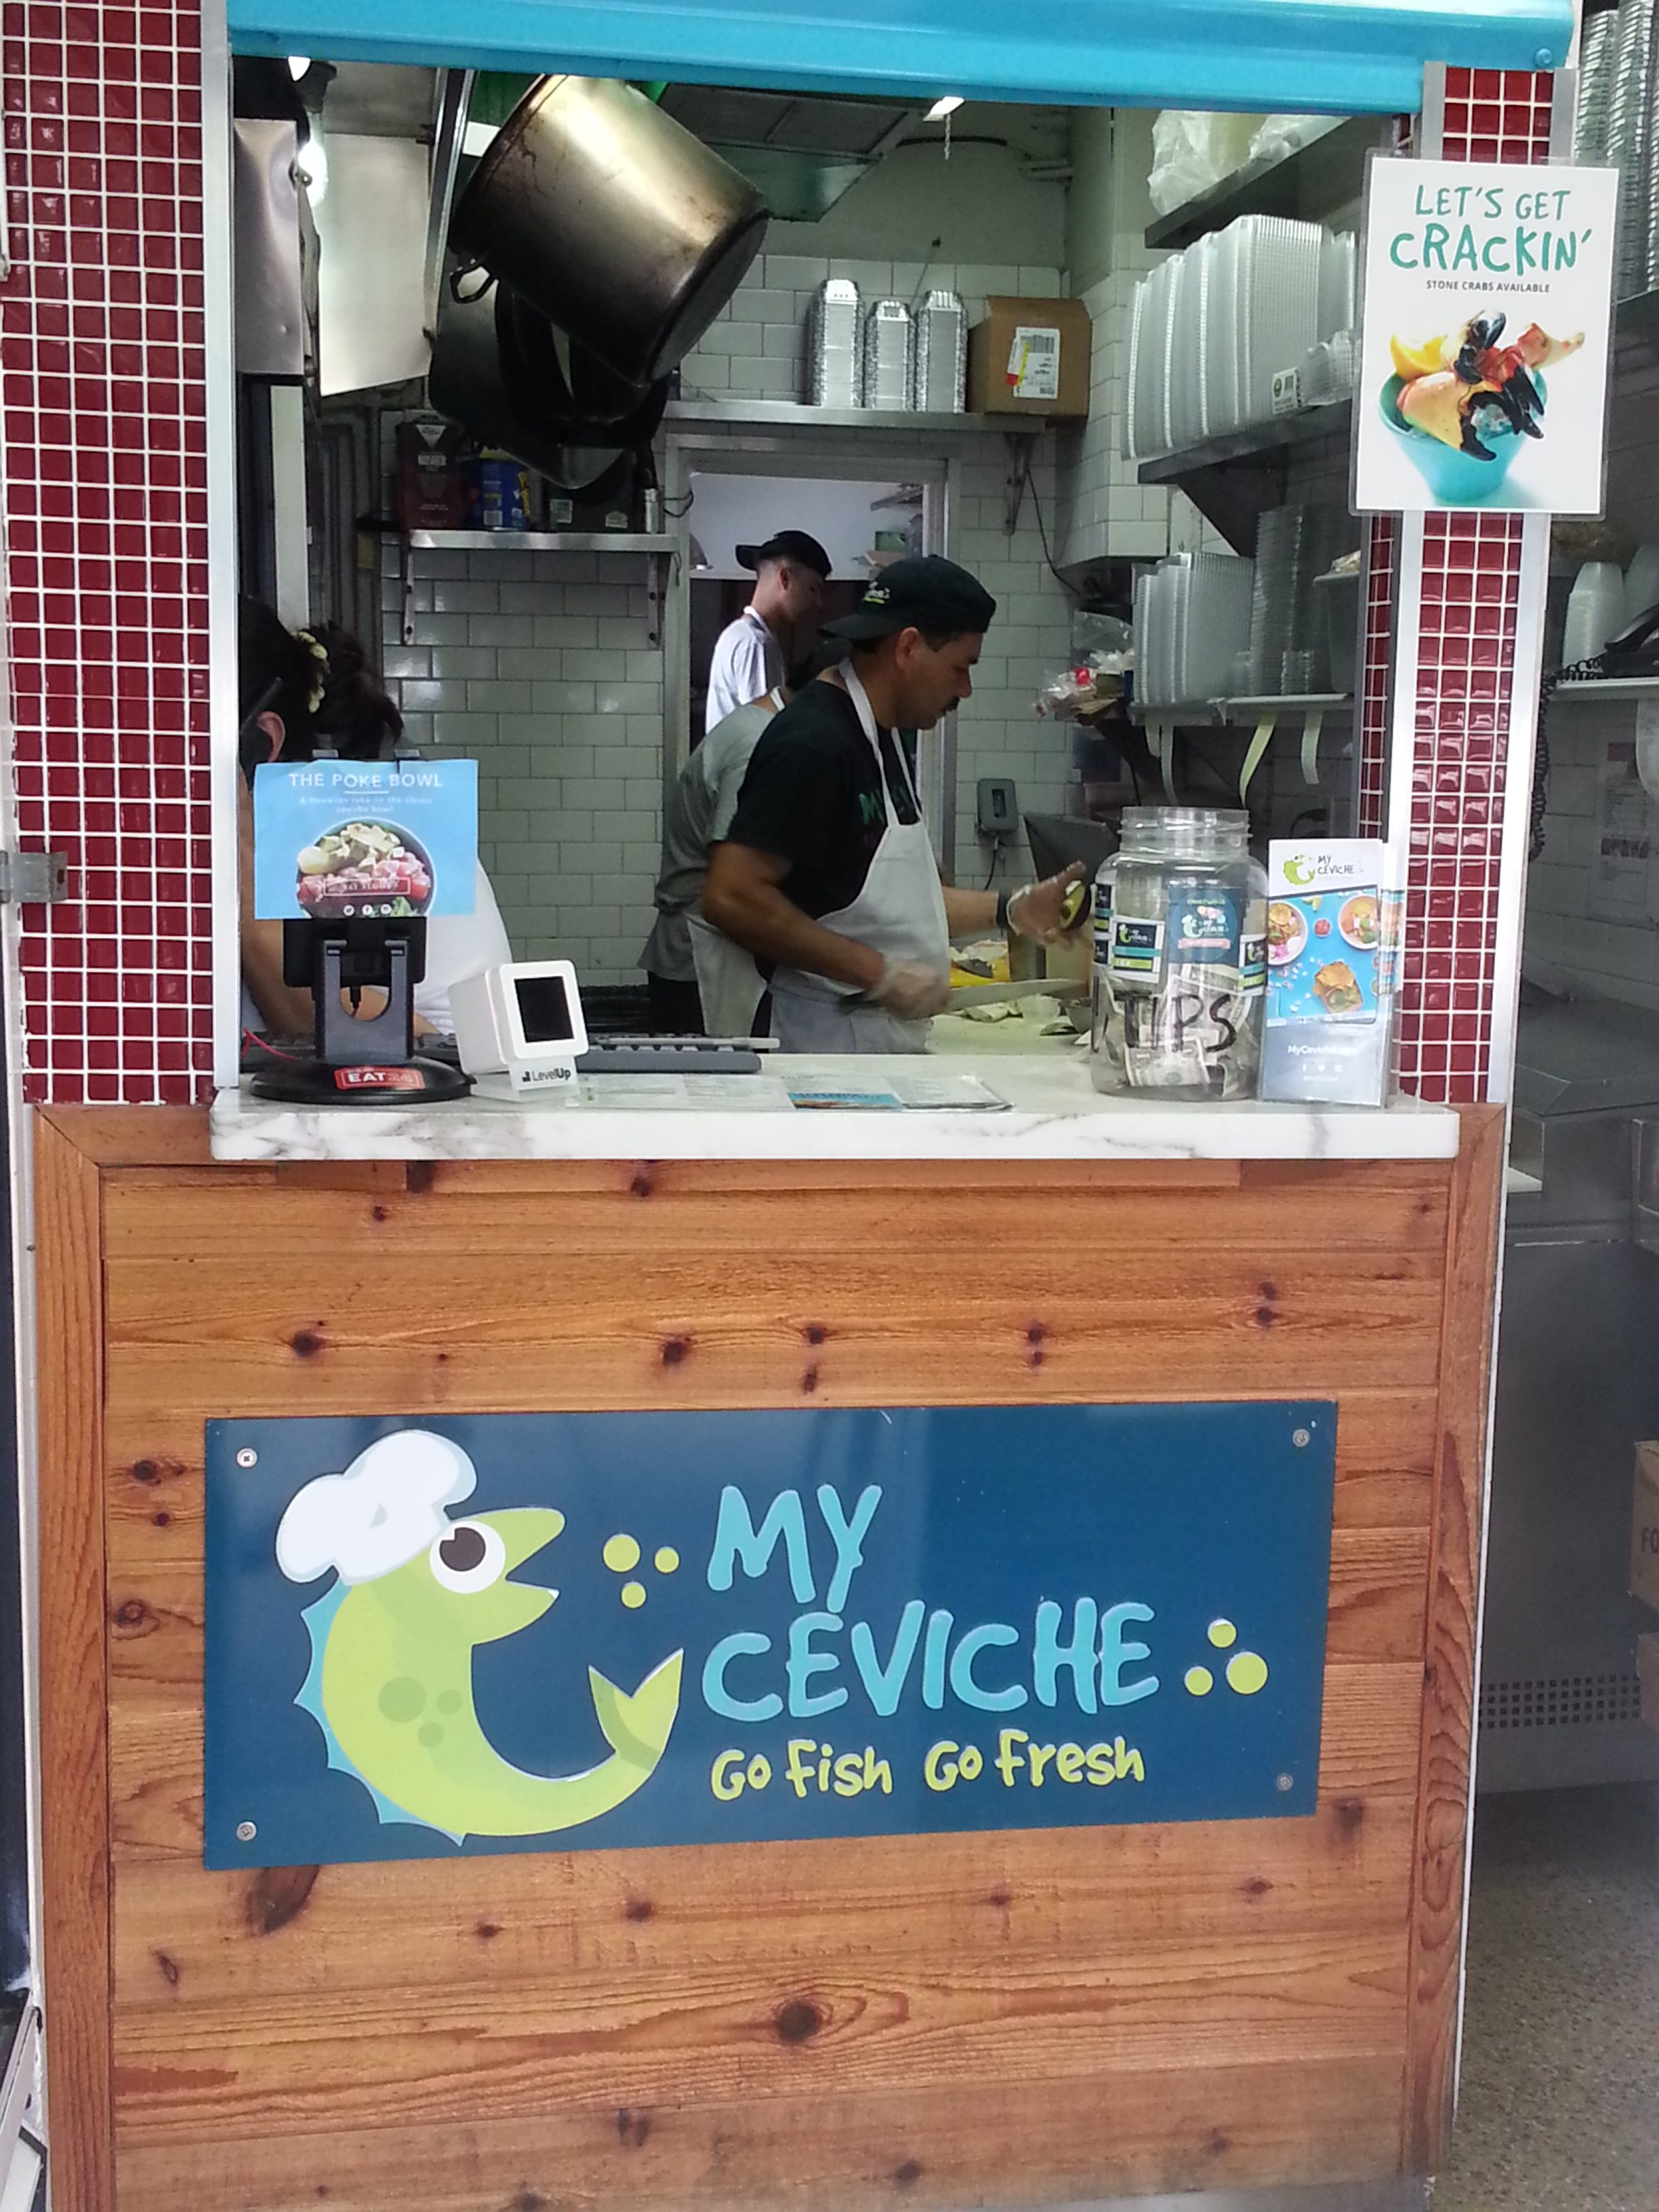 20160416_191516 my ceviche